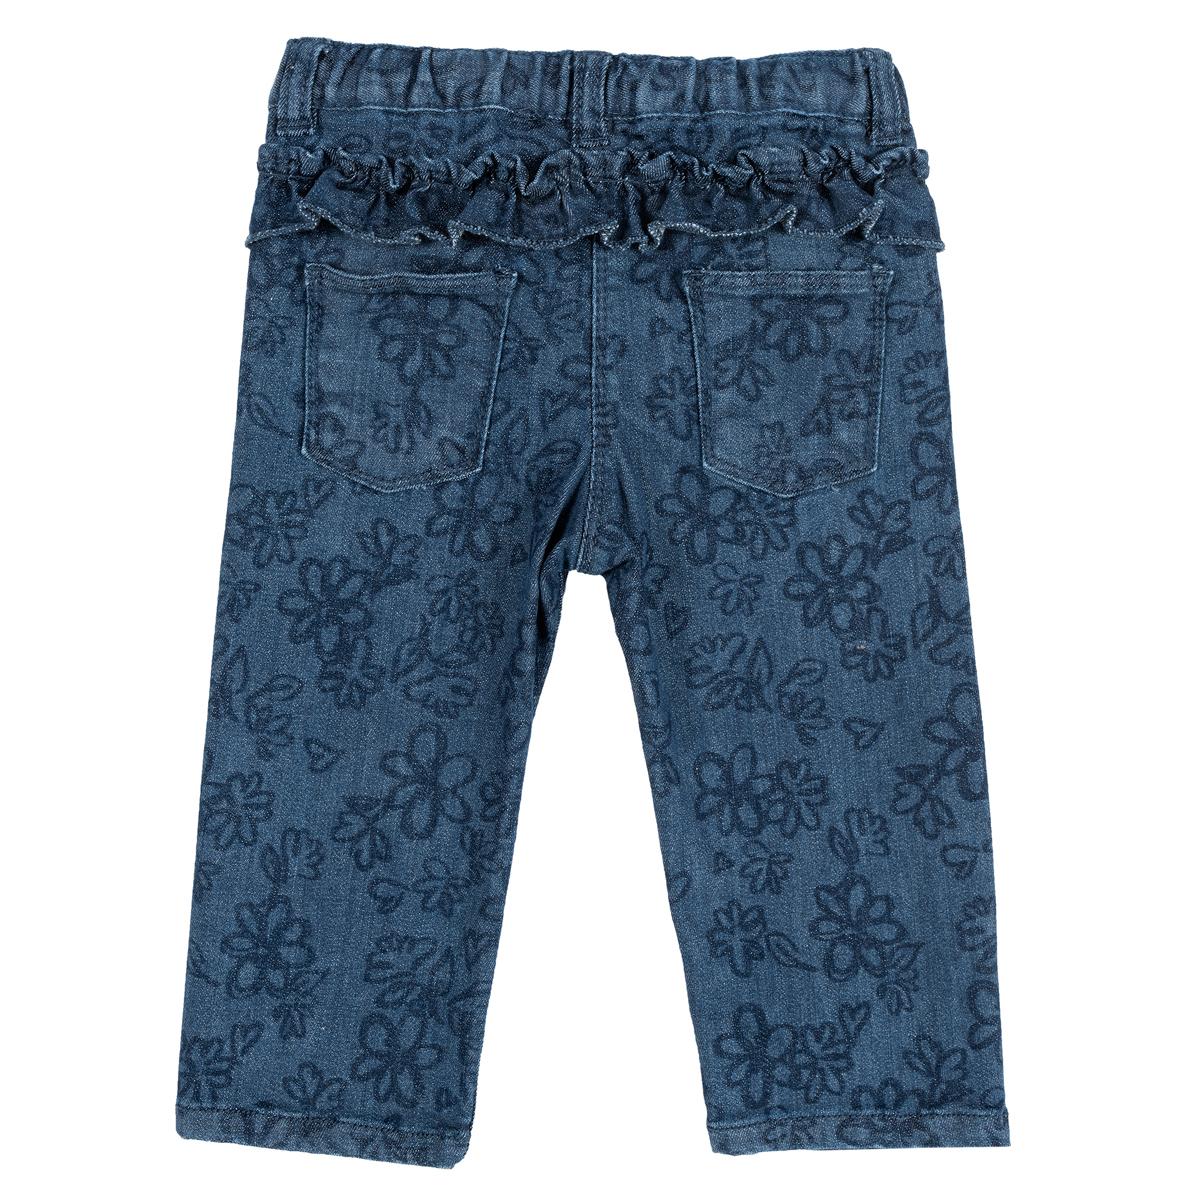 Pantalon Lung Copii Chicco, Denim Elastic, Bleumarin Cu Model, 24971 imagine